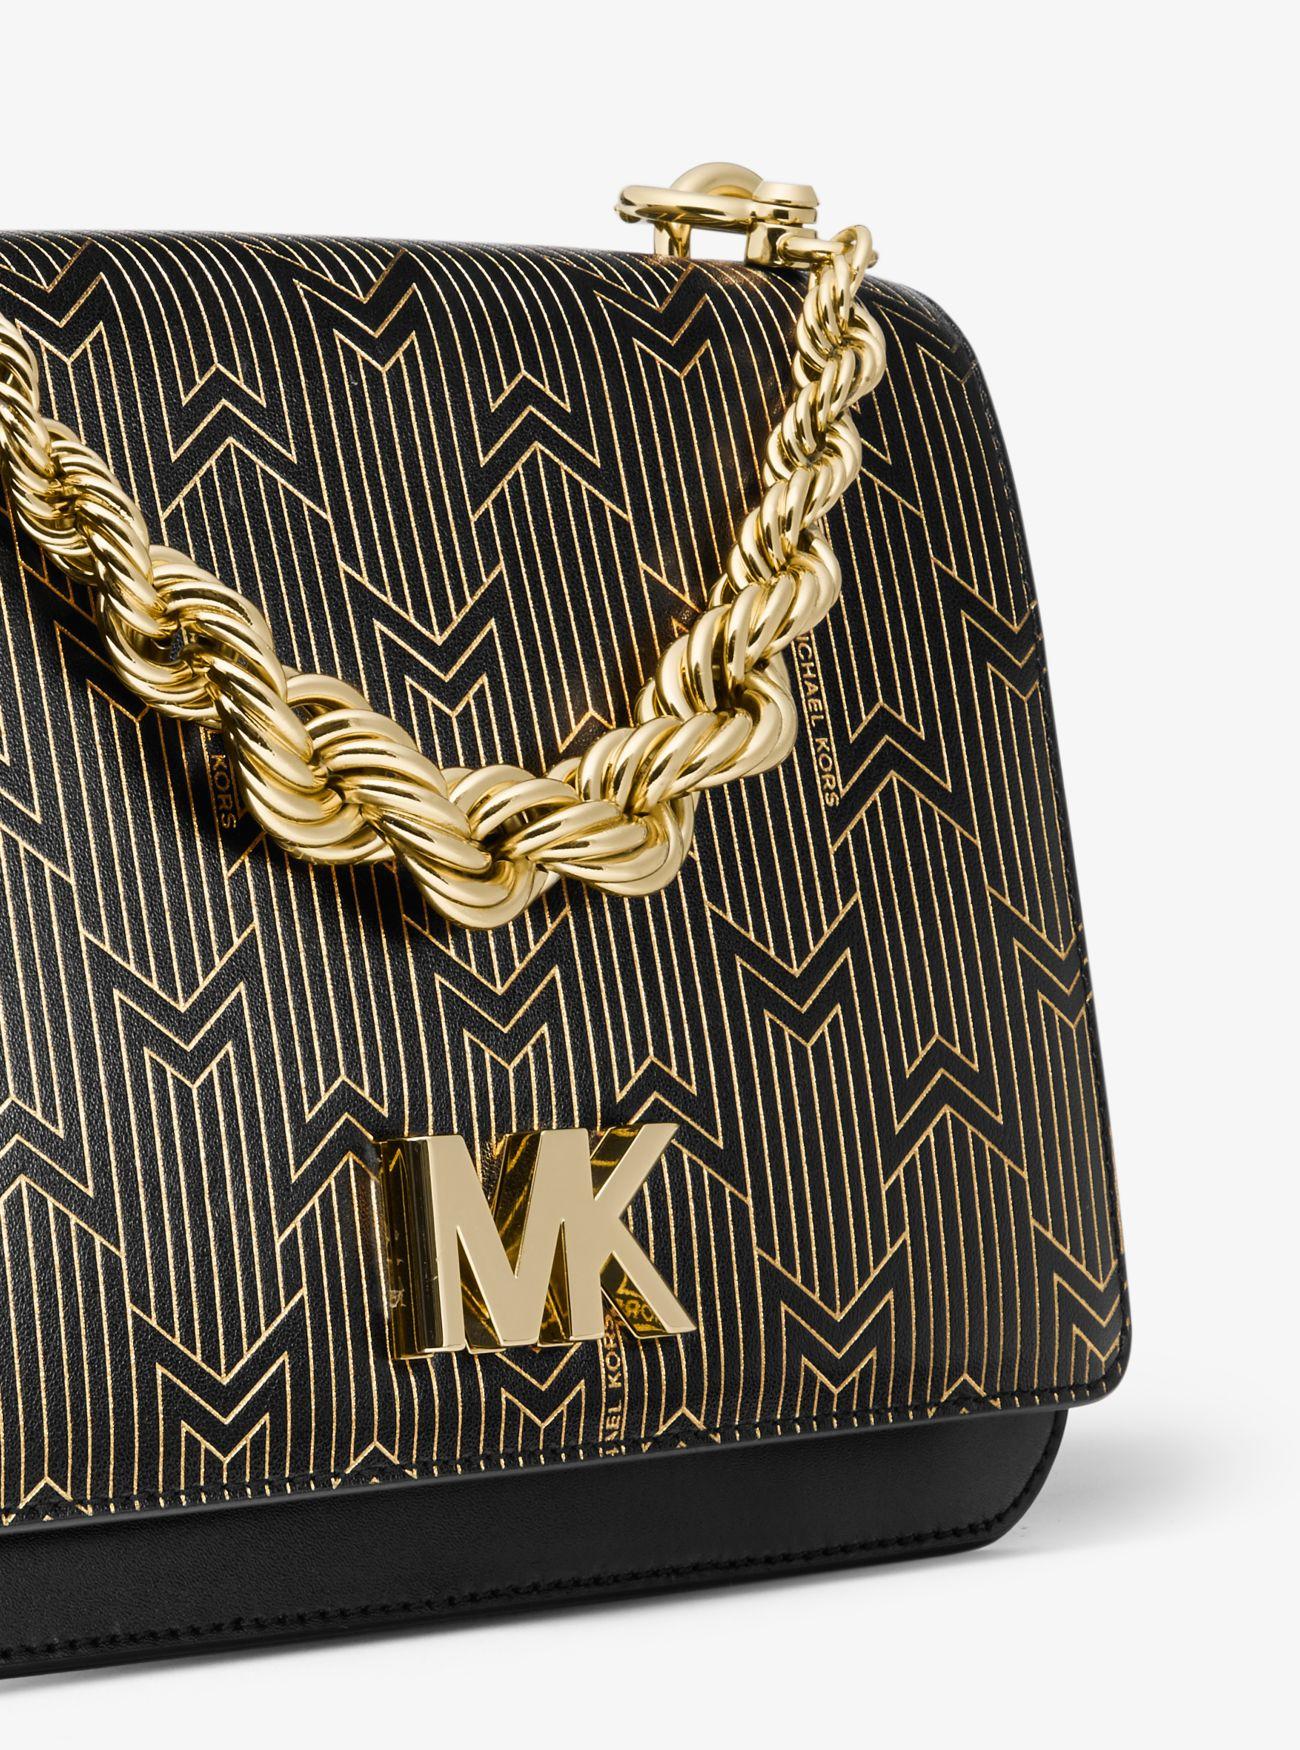 e463580f69ff ... Mott Large Metallic Deco Leather Crossbody Bag